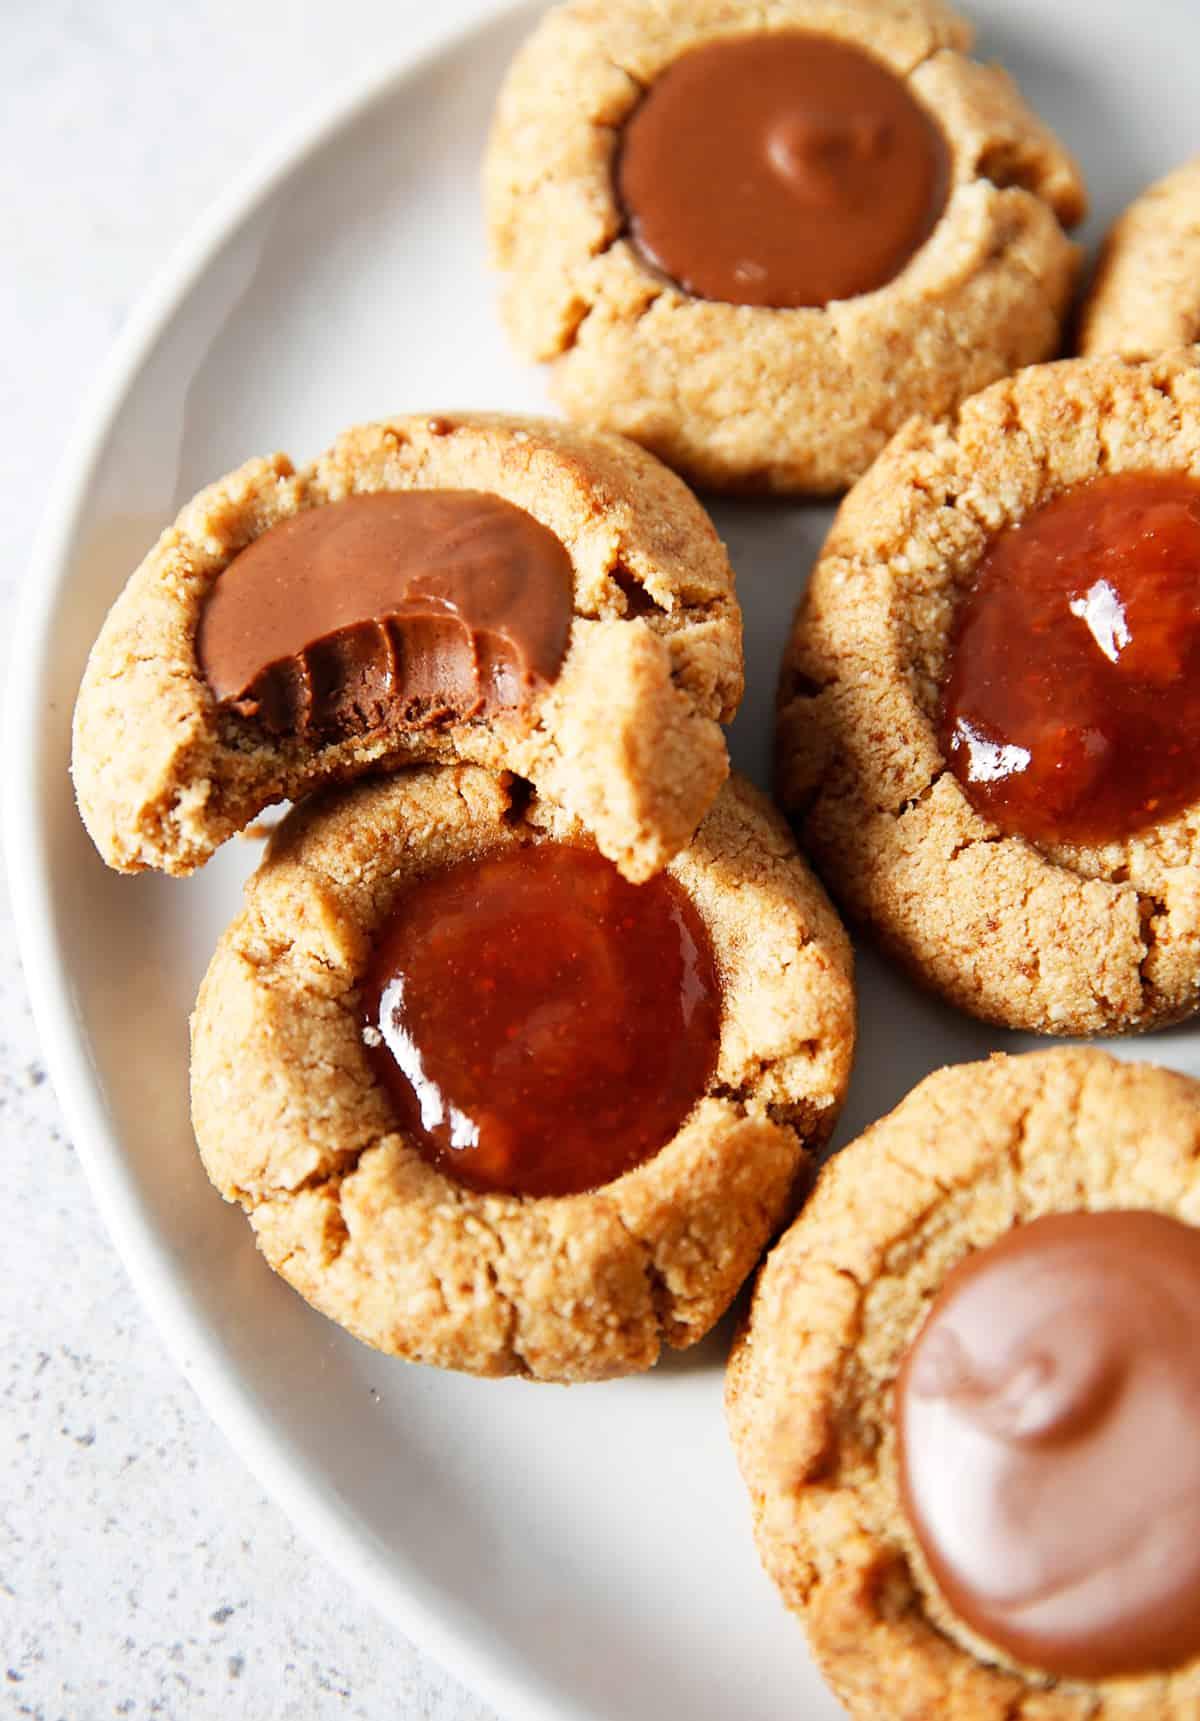 Gluten free thumbprint cookie recipe.